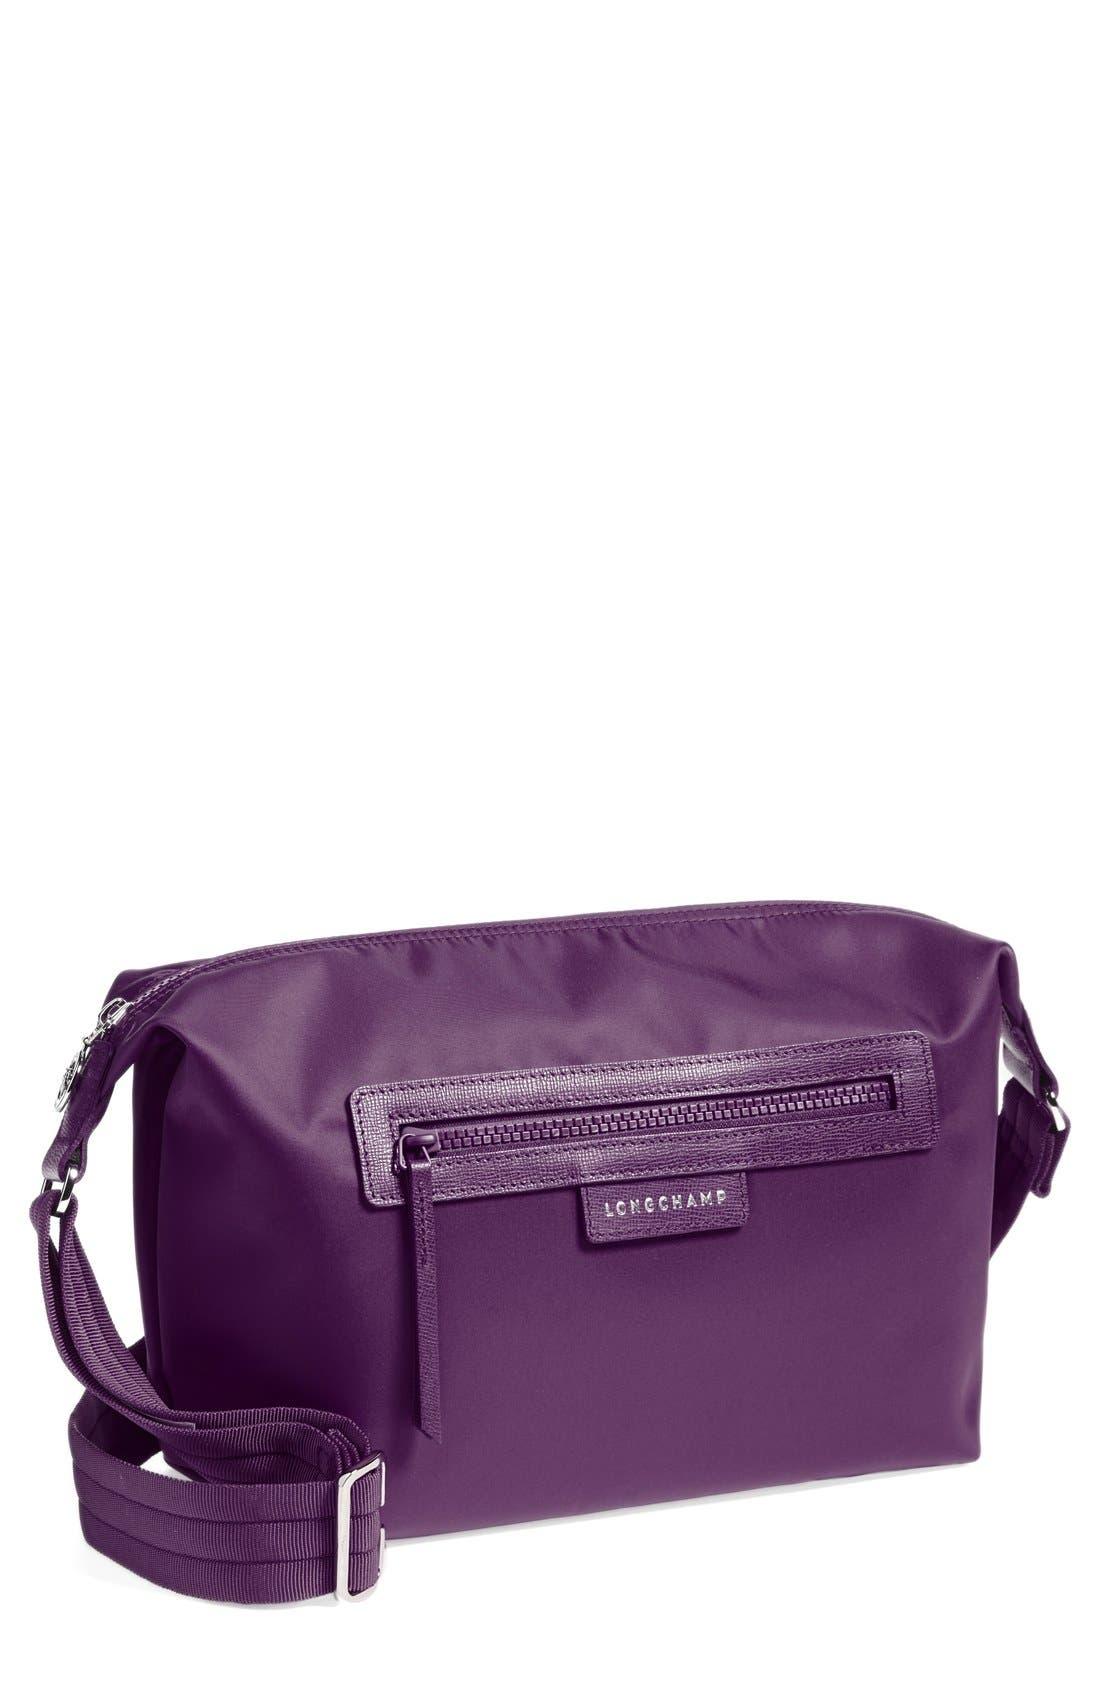 Alternate Image 1 Selected - Longchamp 'Le Pliage Neo' Nylon Crossbody Bag